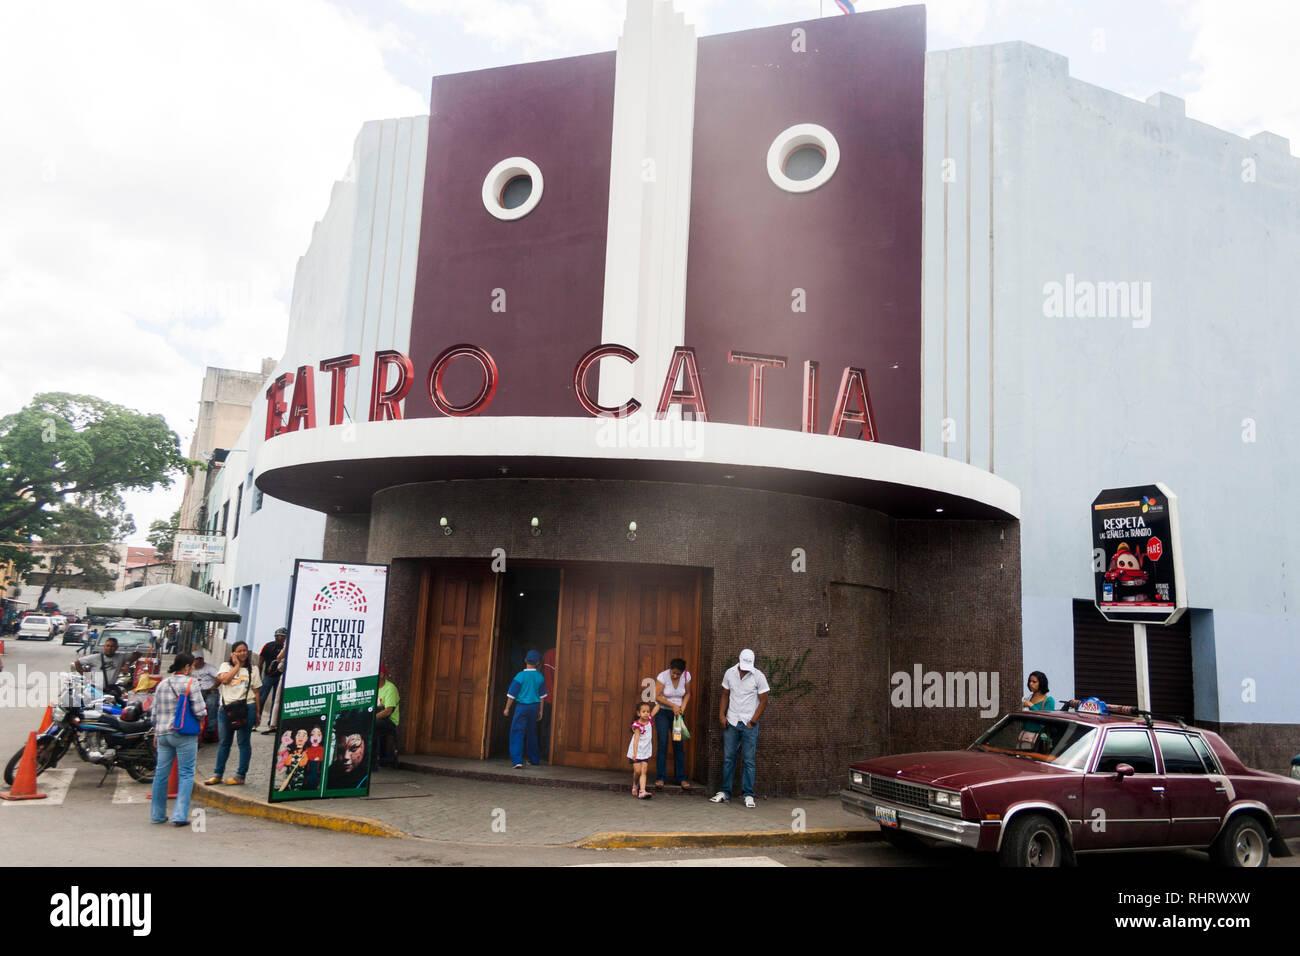 Caracas, Dtto Capital / Venezuela - 03/05/2013.Facade Catia Theater in Catia neighborhood. - Stock Image